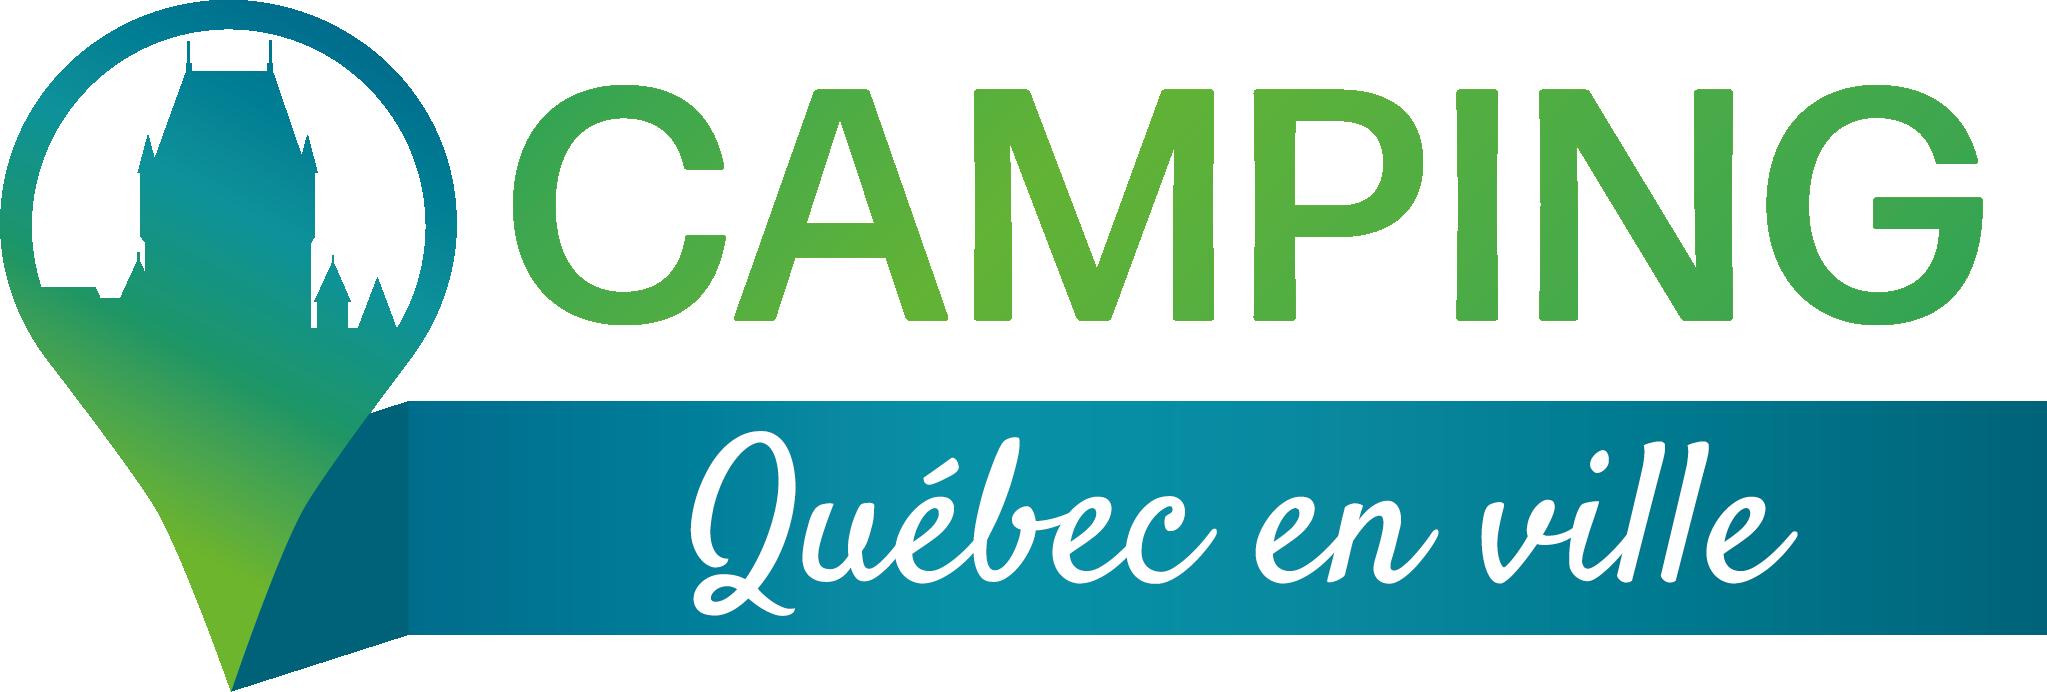 Logo Camping Québec en ville